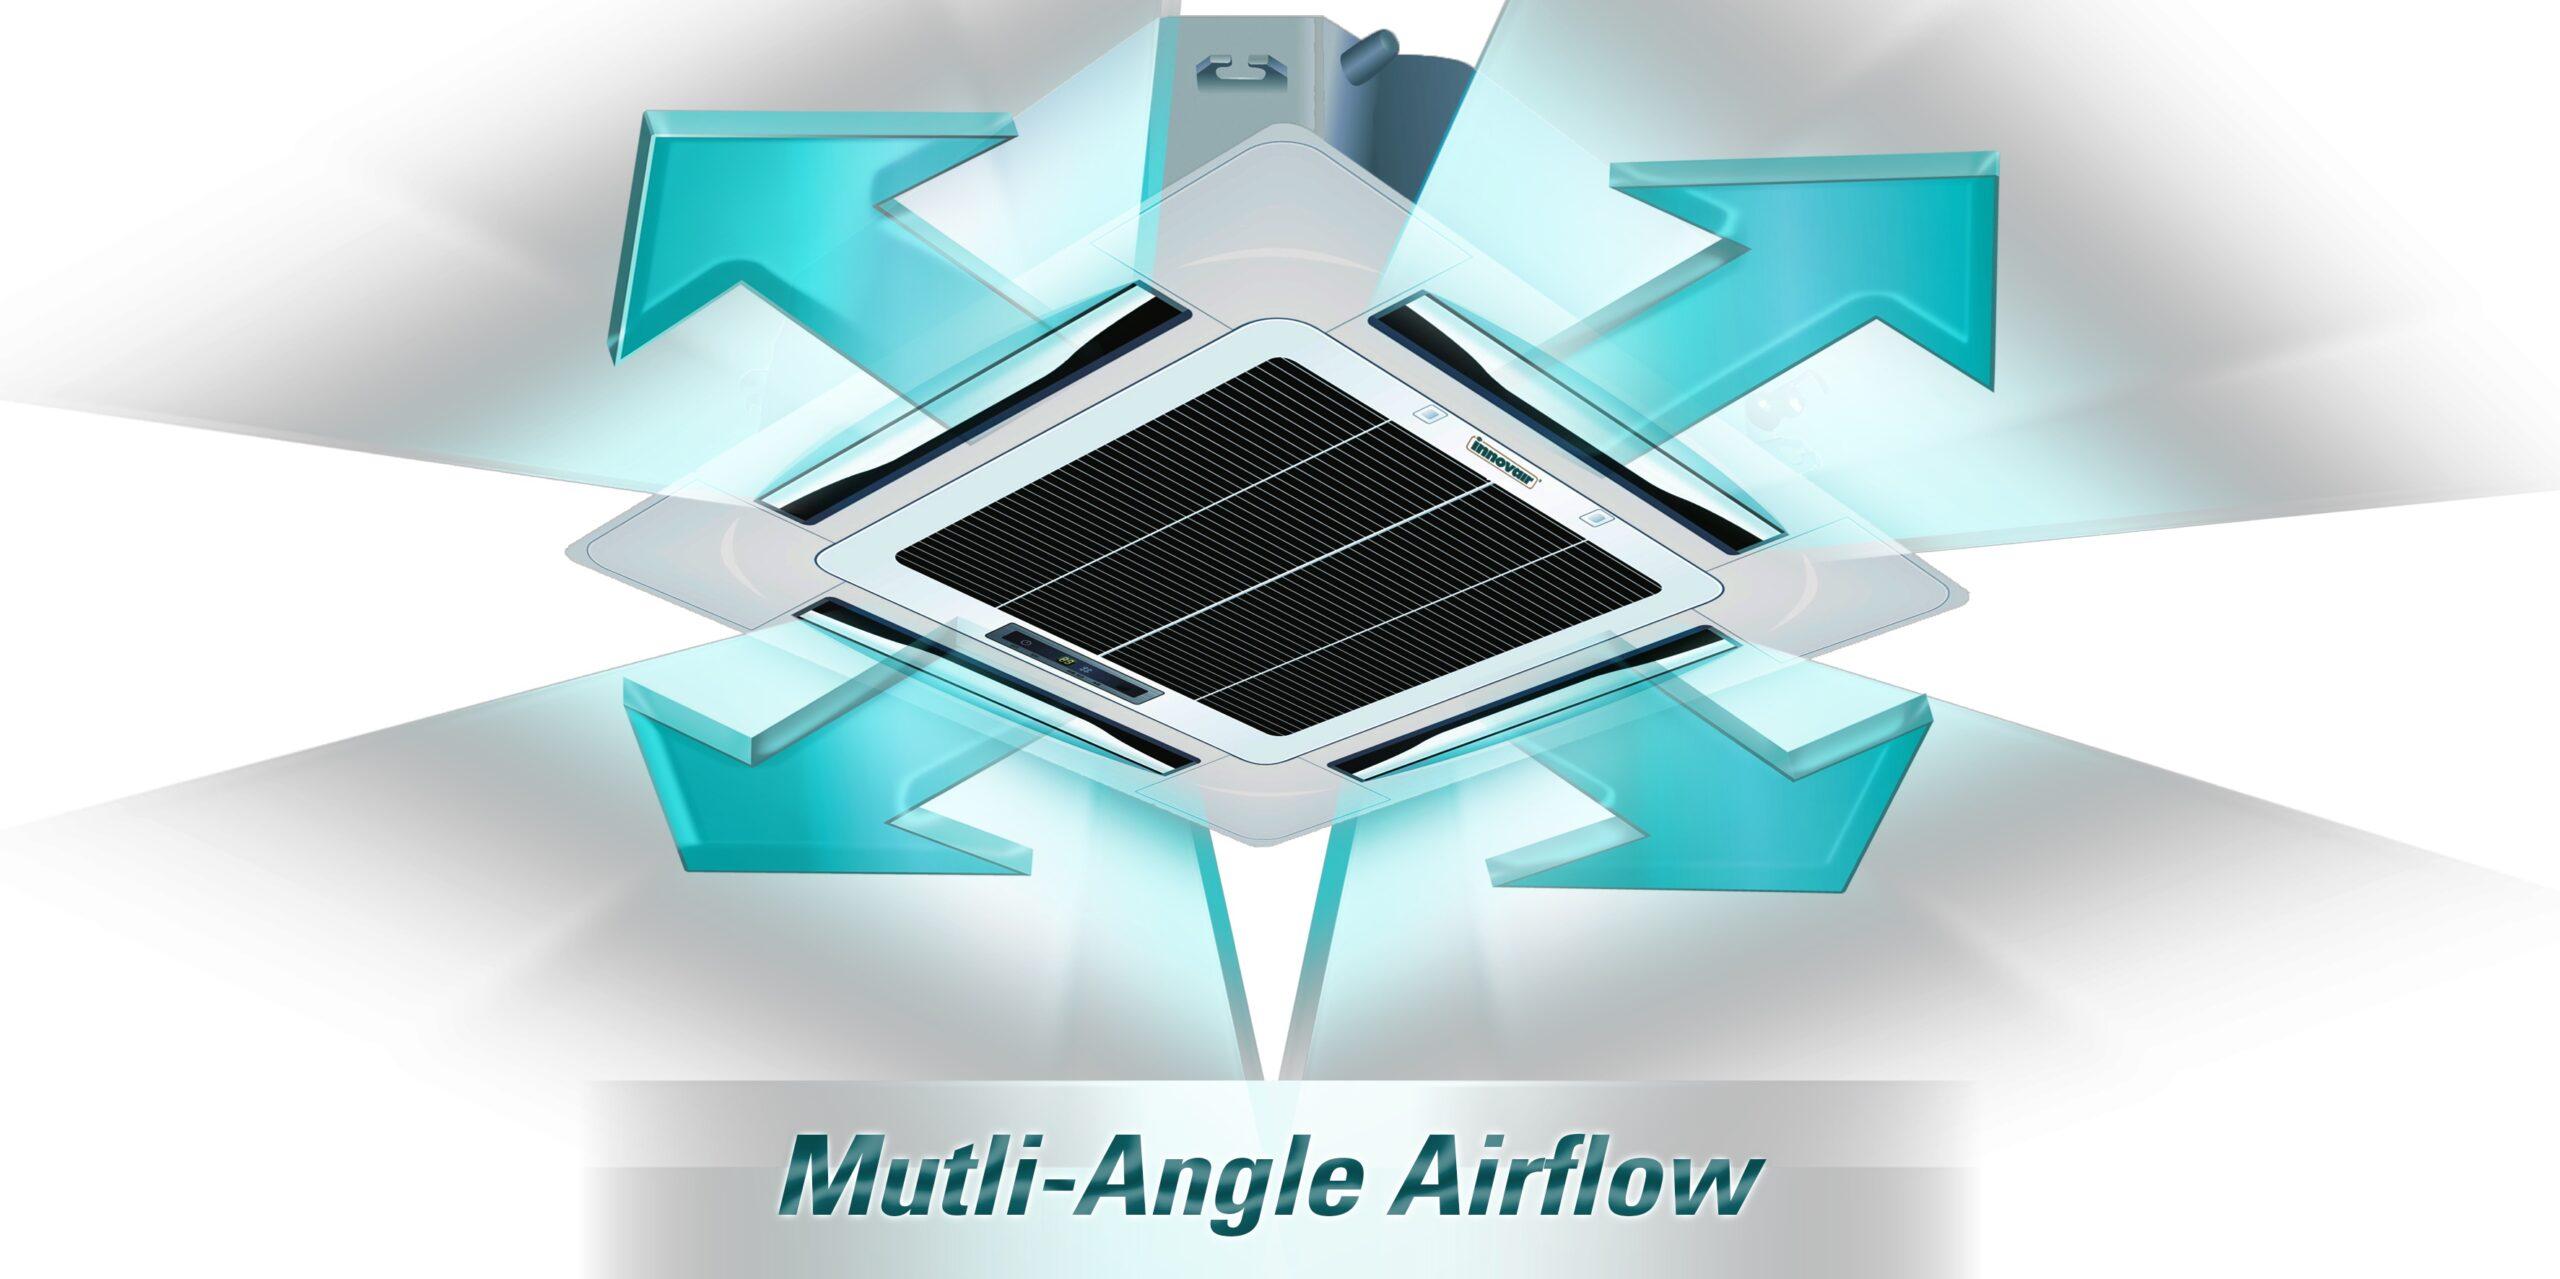 Multi-angle Airflow